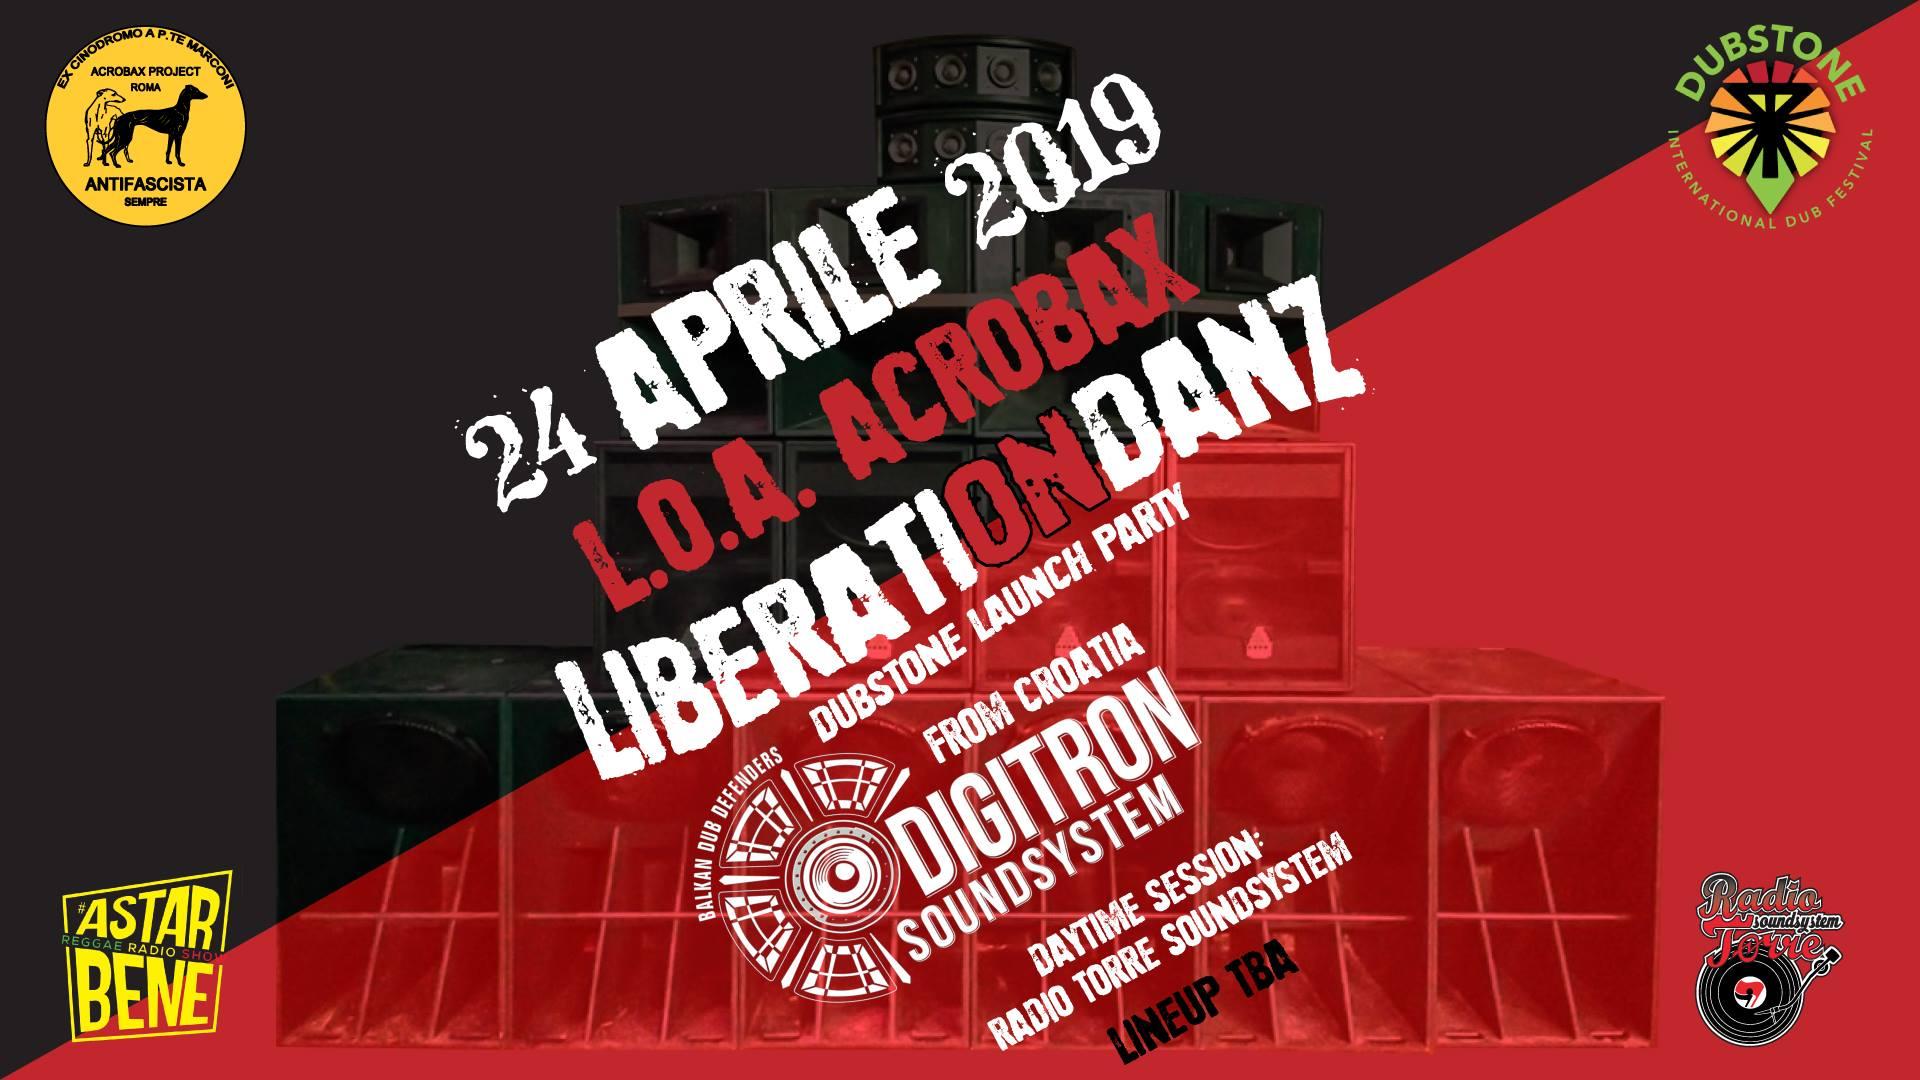 Mercoledì 24 Aprile/ Digitron Sound System at Acrobax - Liberati on danz!